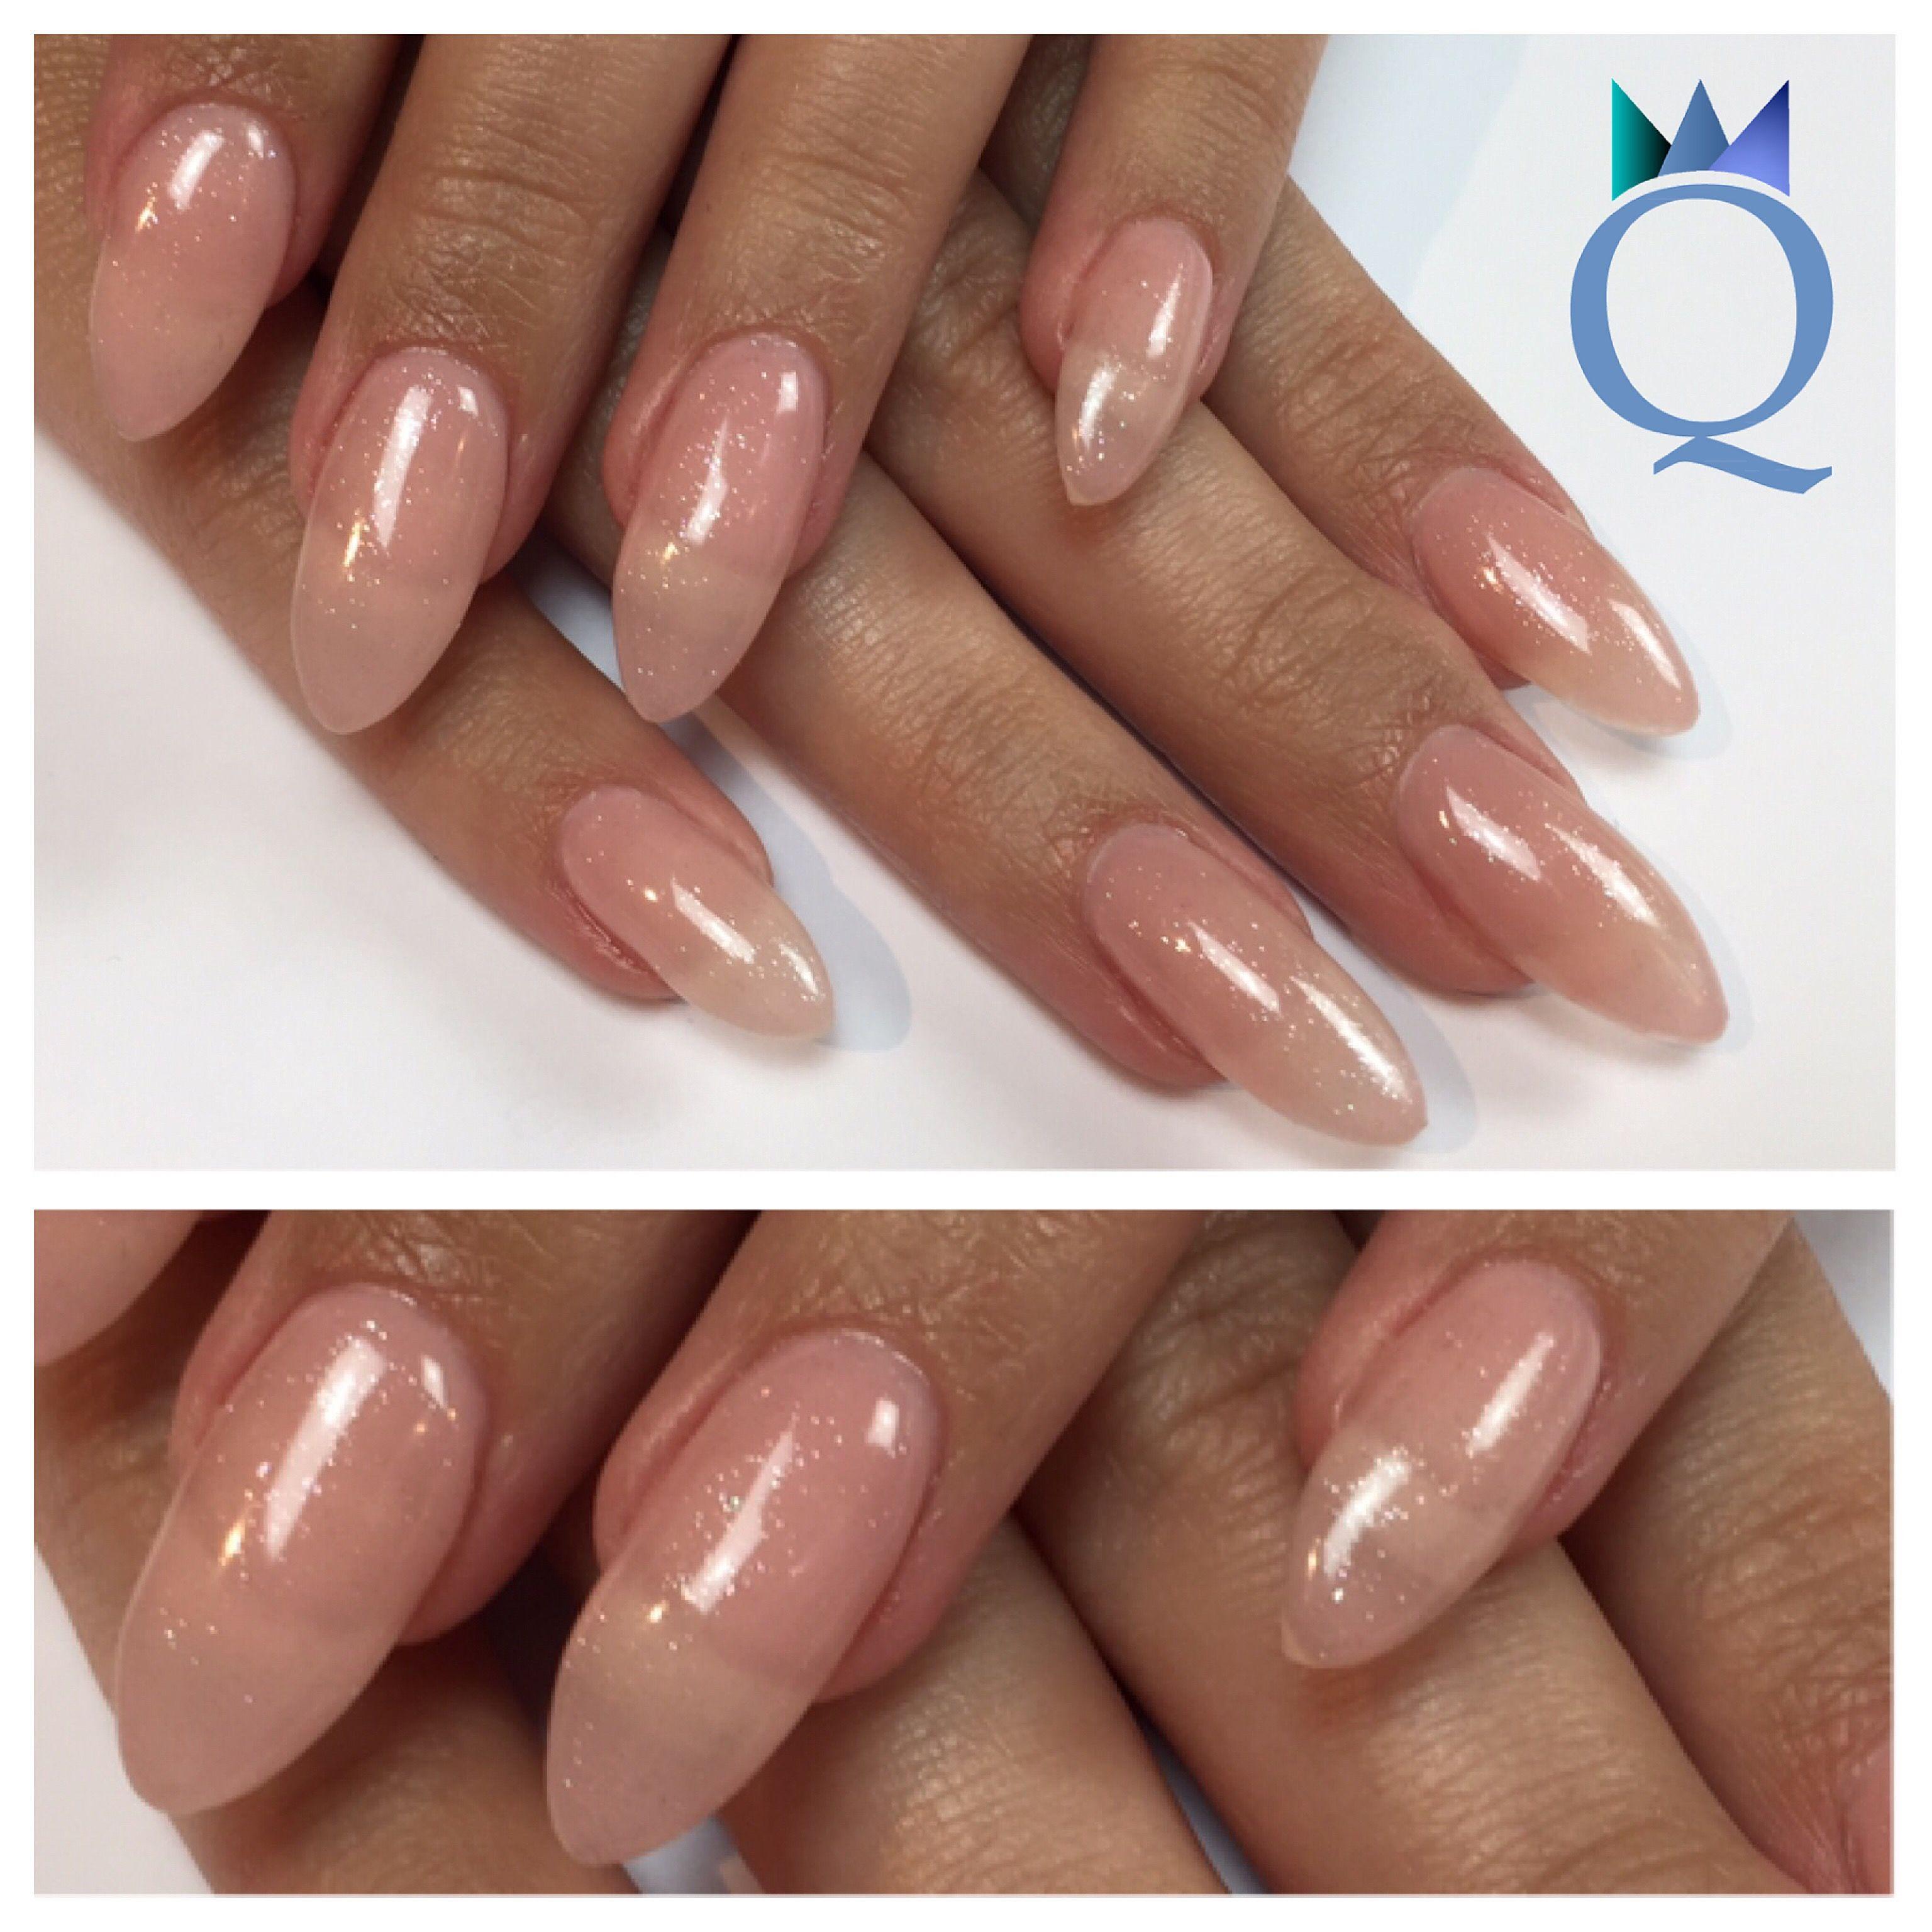 almondnails #gelnails #nails #nudenails #fineglitter #yvesswiss ...